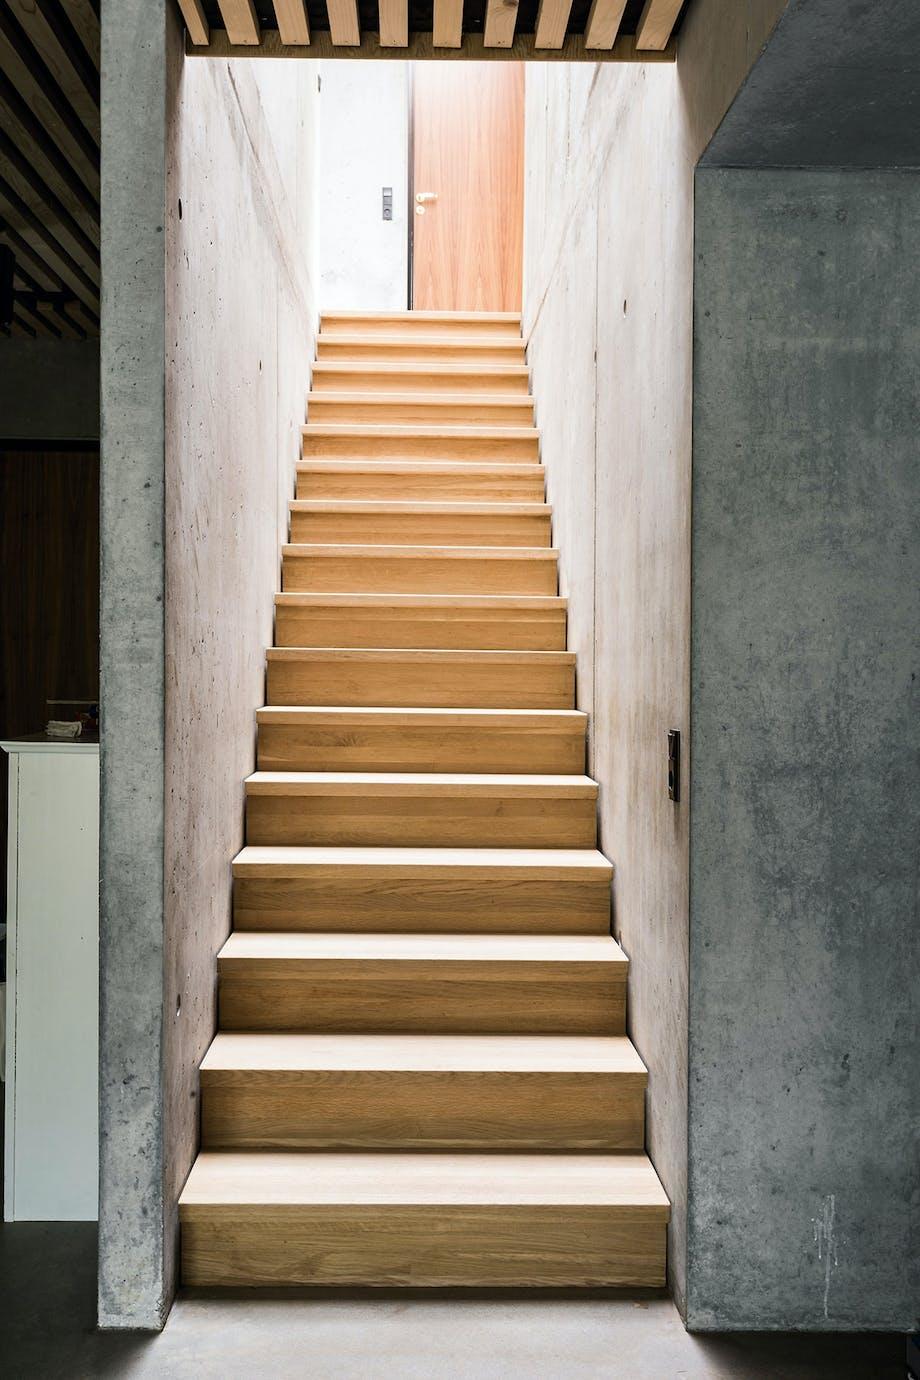 trappe træ beton